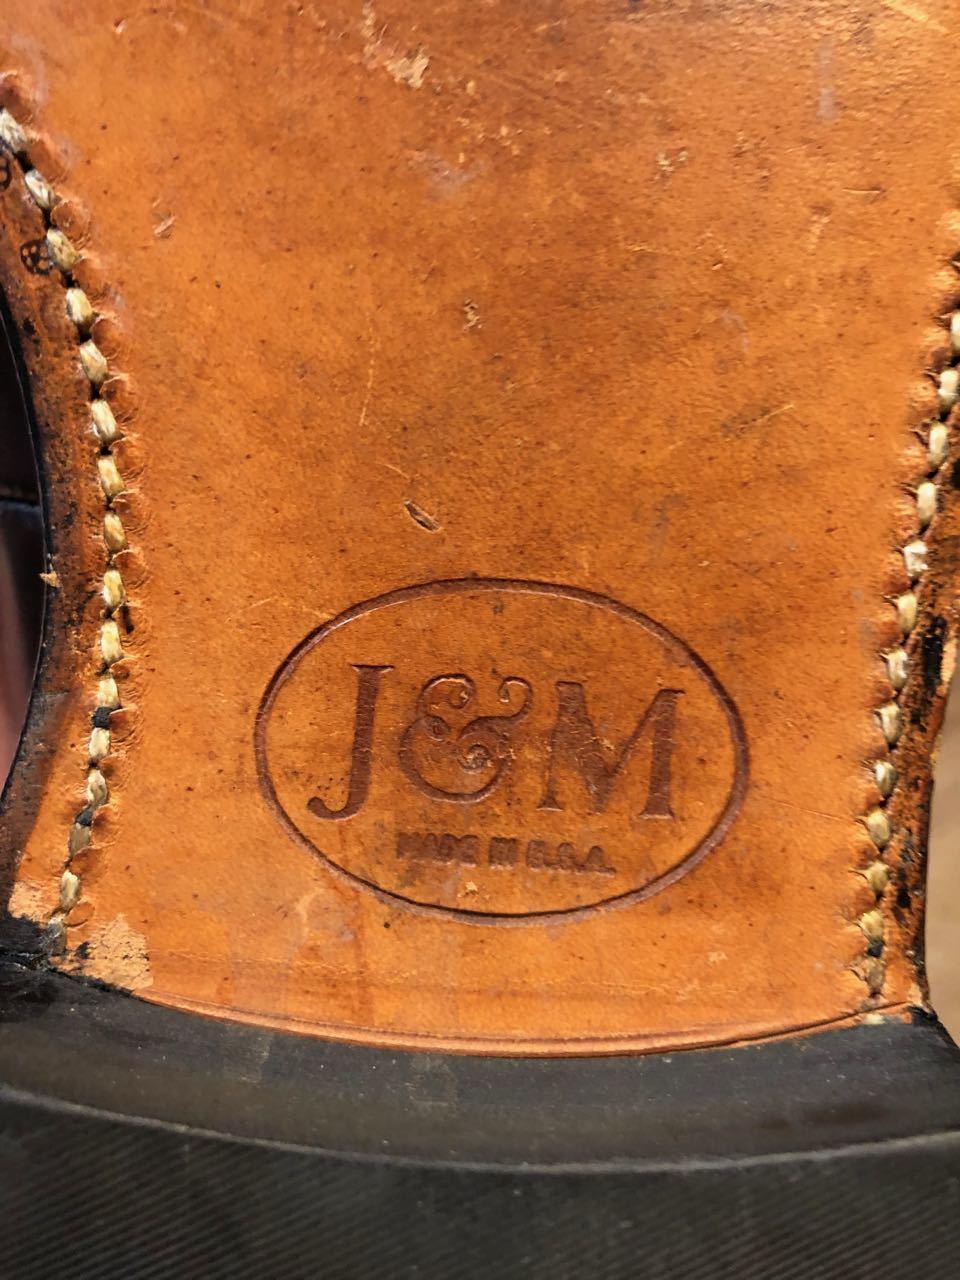 J&M (JOHNSTON&MURPHY) ARISTCRAFT ジョンストン&マーフィー アリストクラフト_c0144020_13085893.jpg